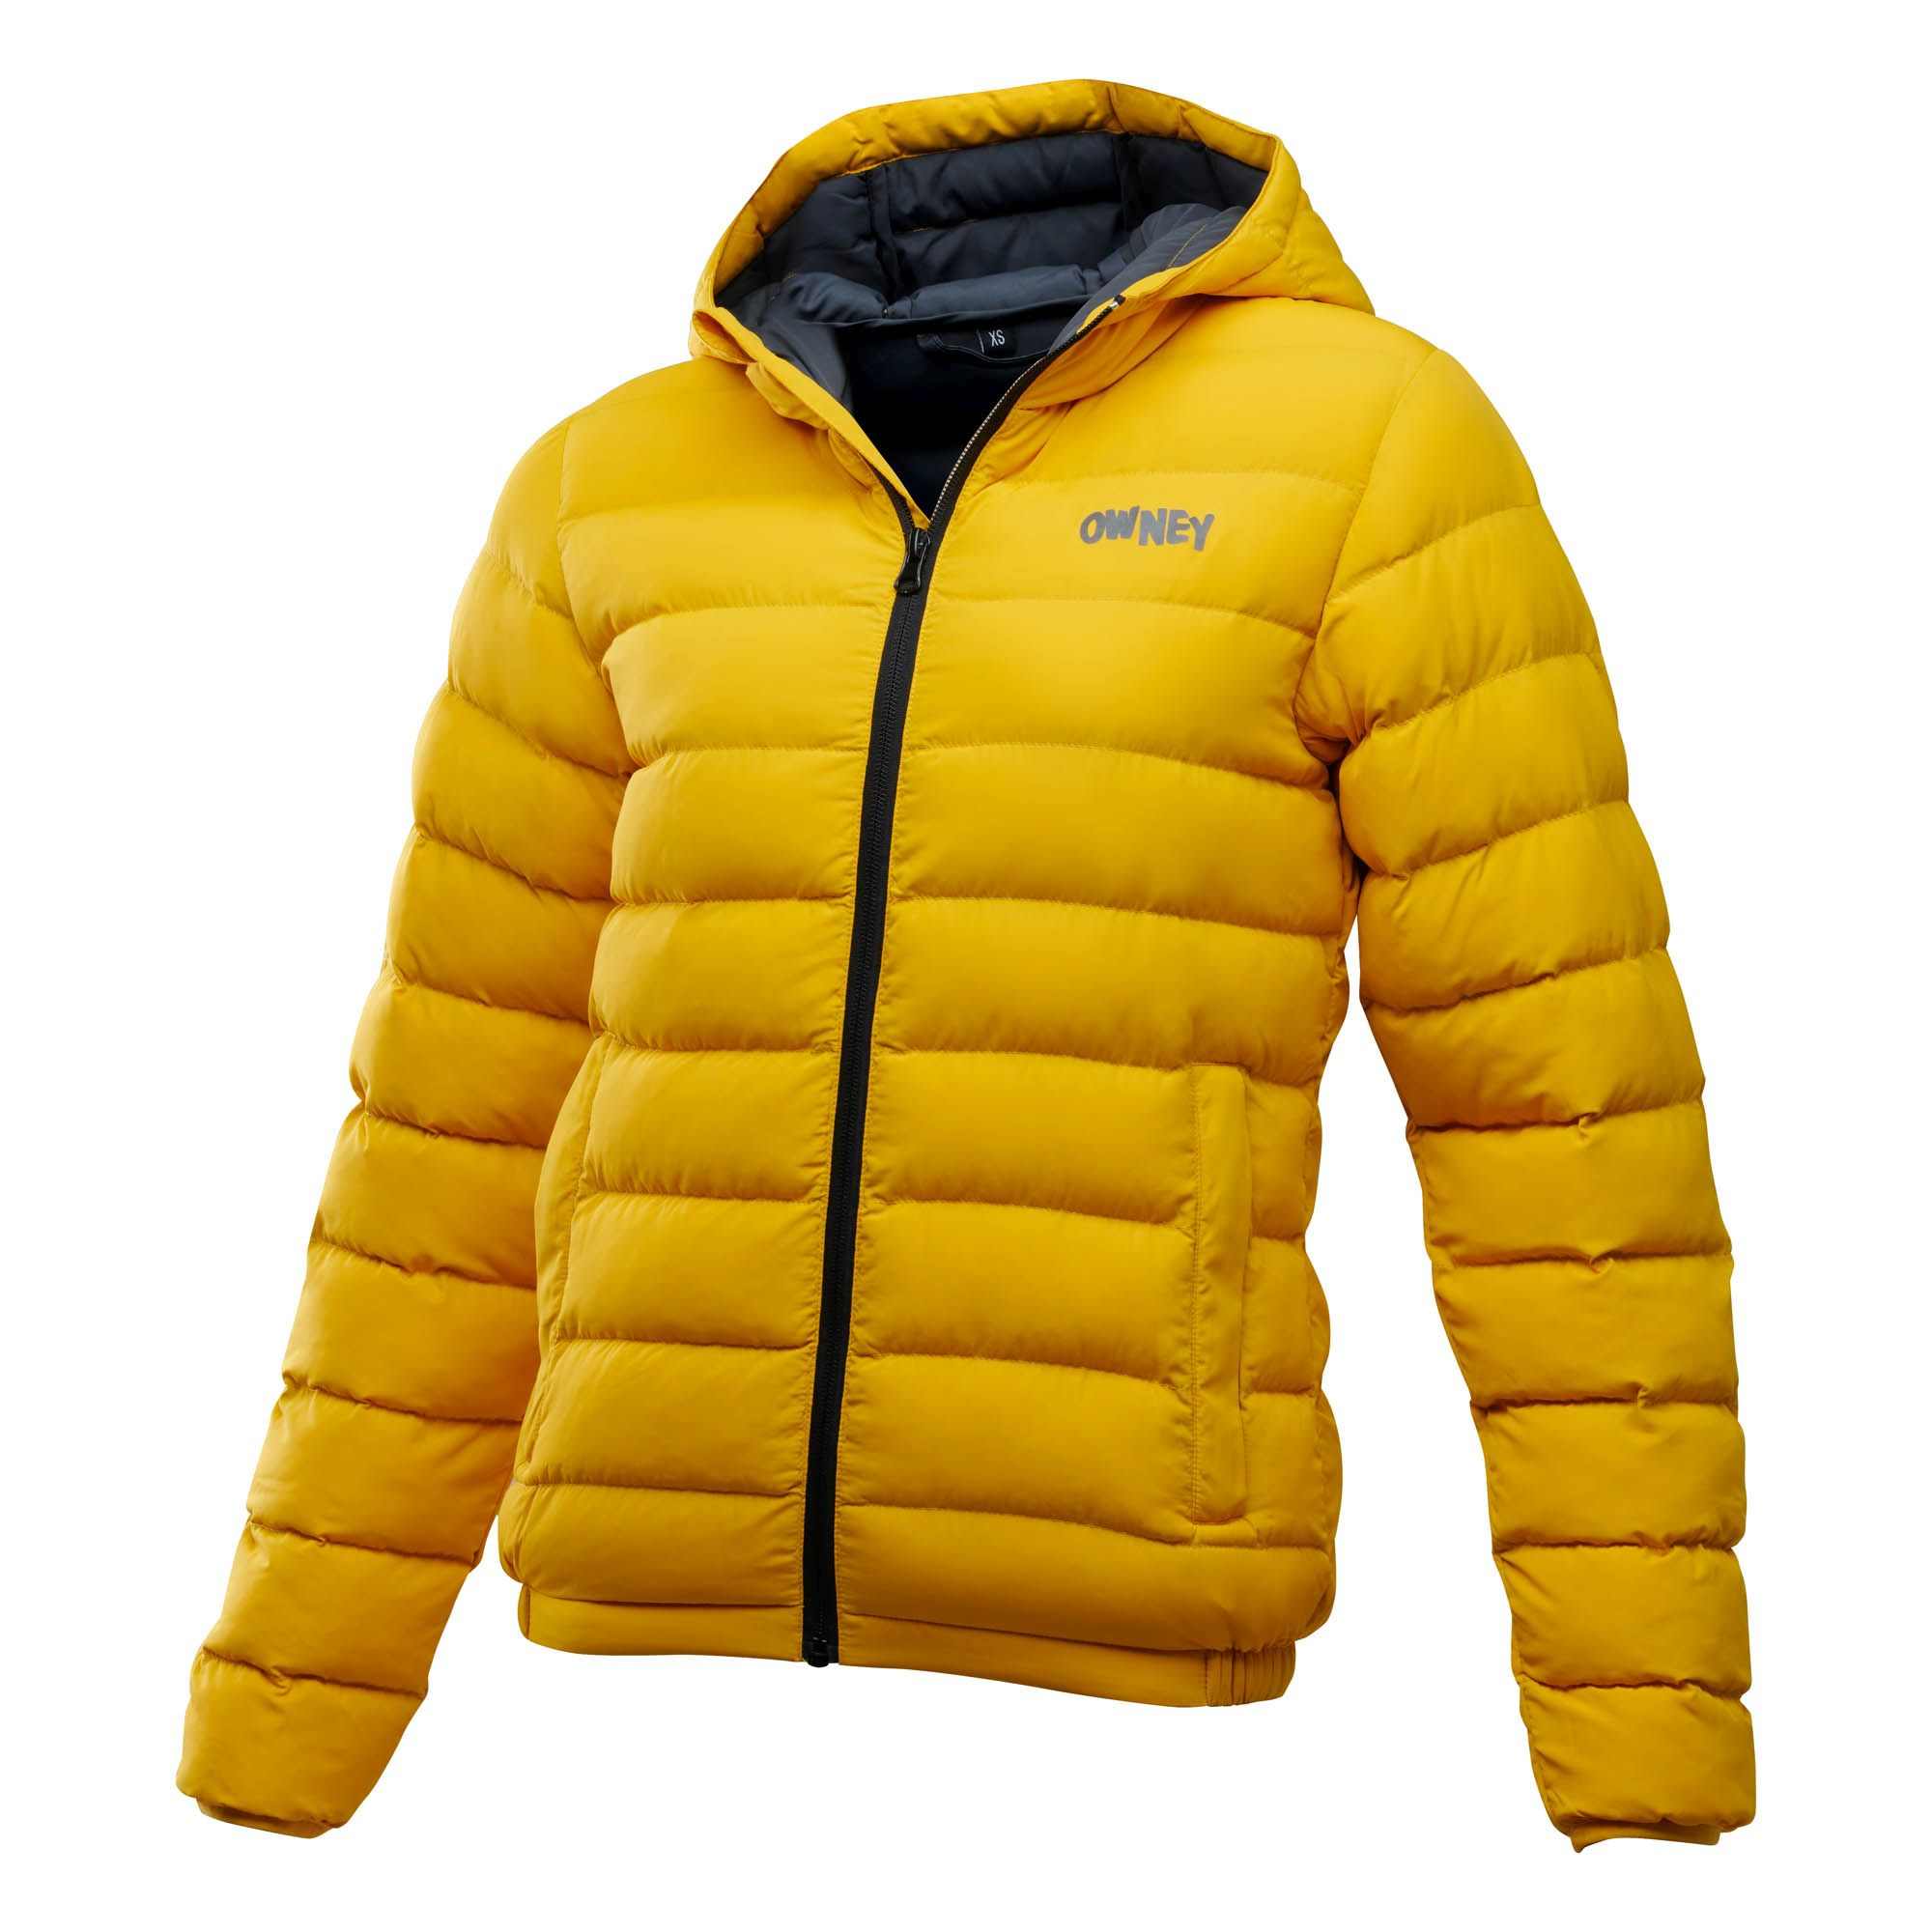 Owney PL Jacket Women